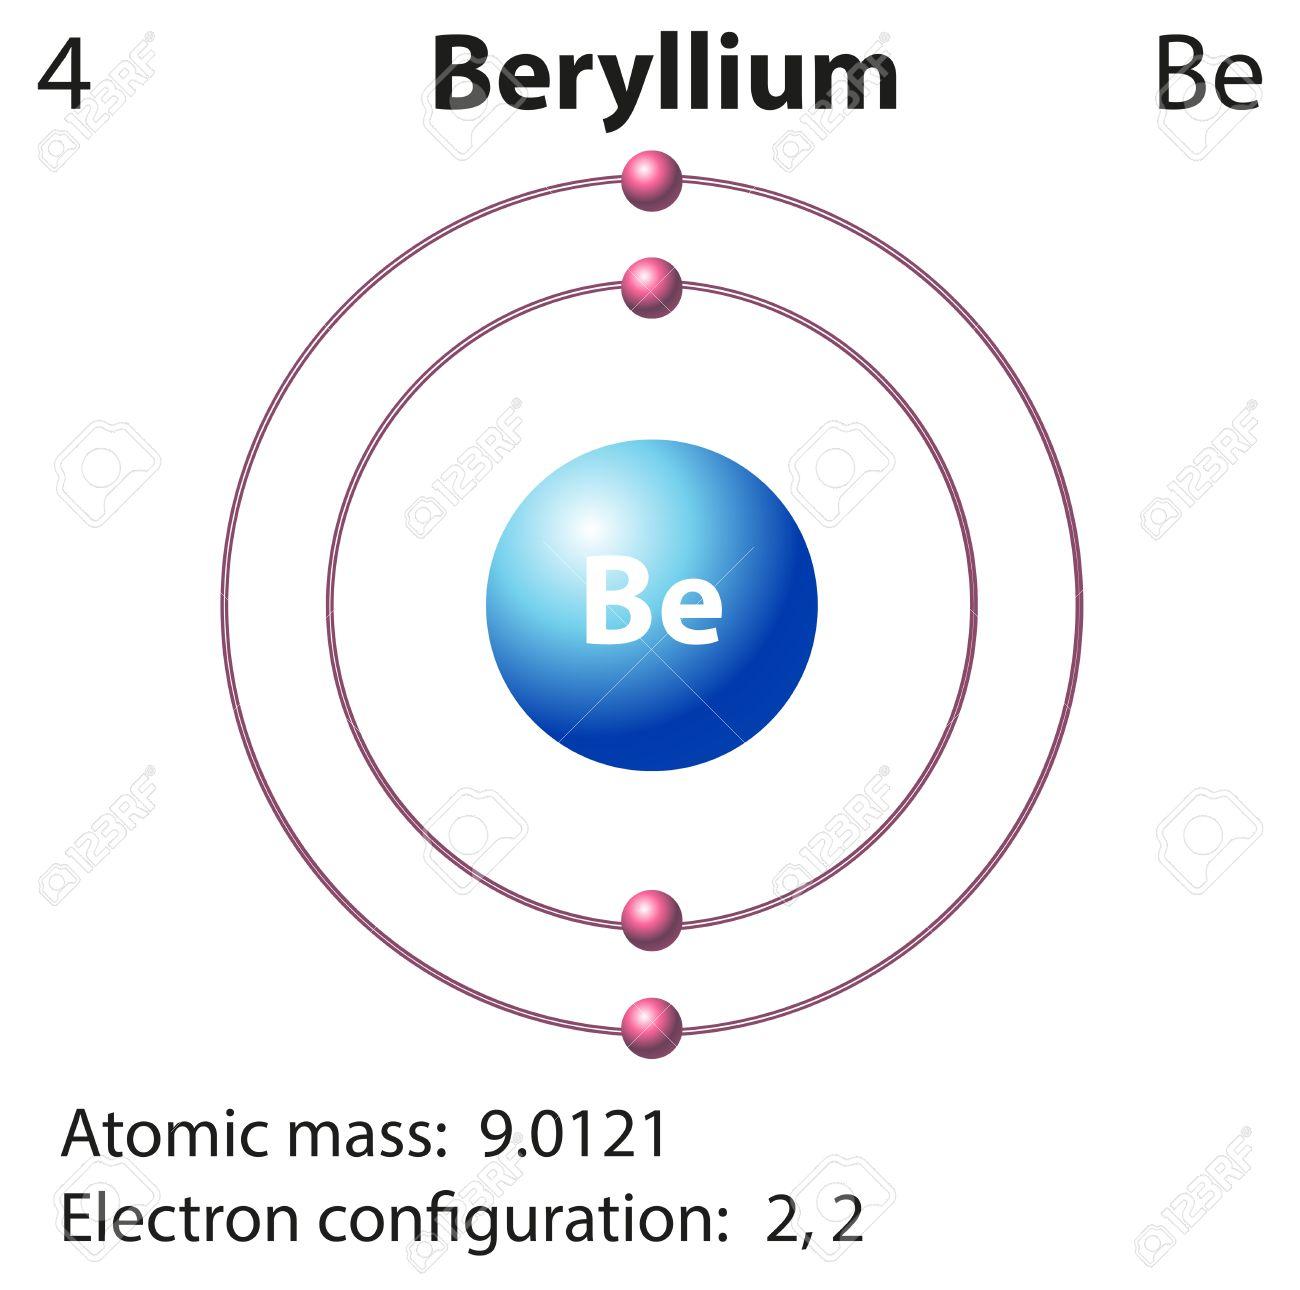 diagram representation of the element beryllium illustration stock vector -  44789610